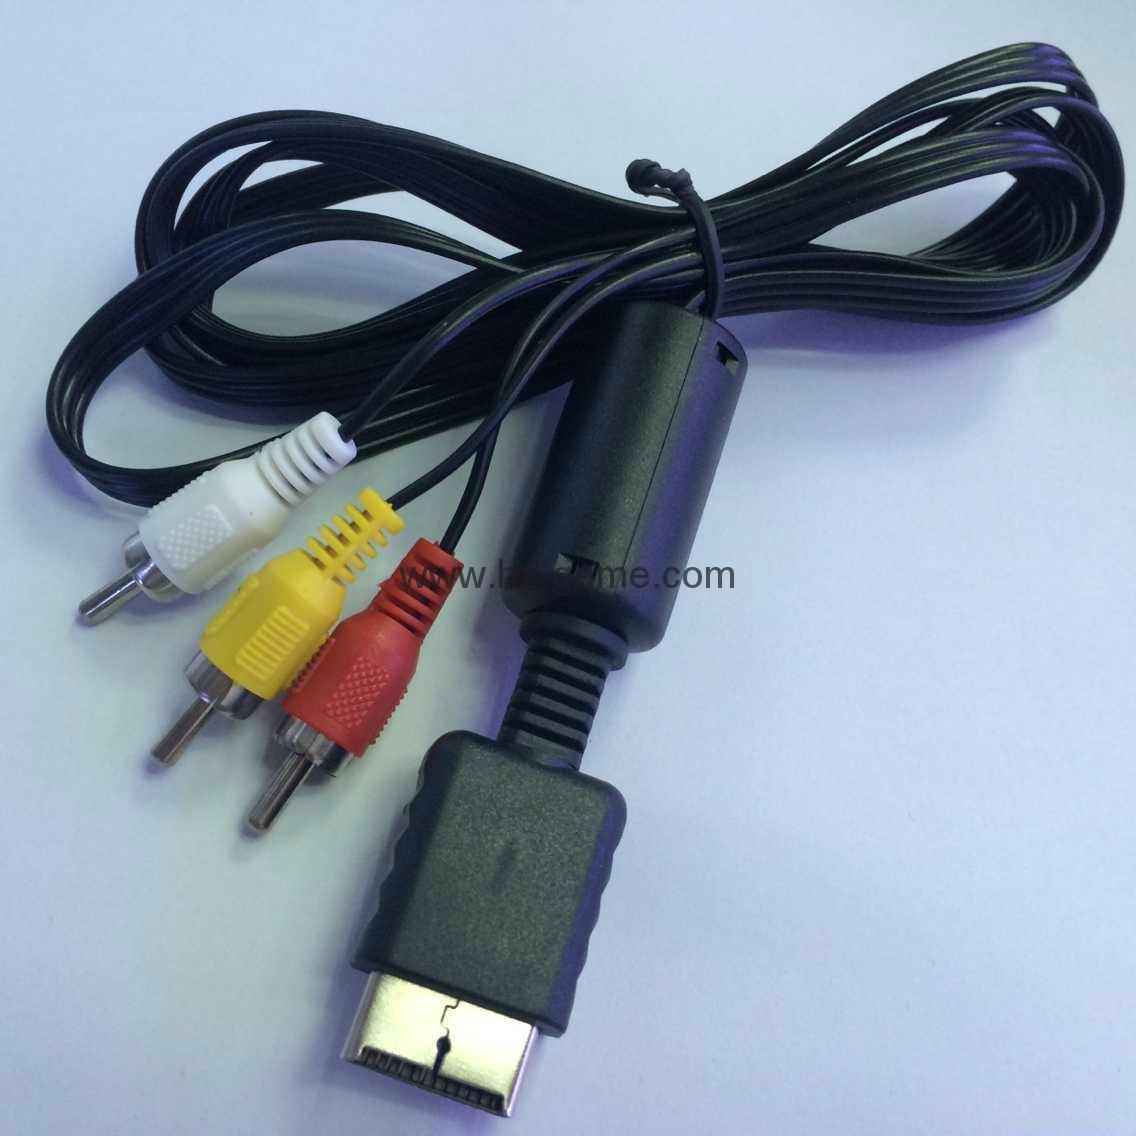 PS2 NIDEC日产电机马达,PS2薄机,7万,9万马达,SCPH-7900X主轴驱动马达 16